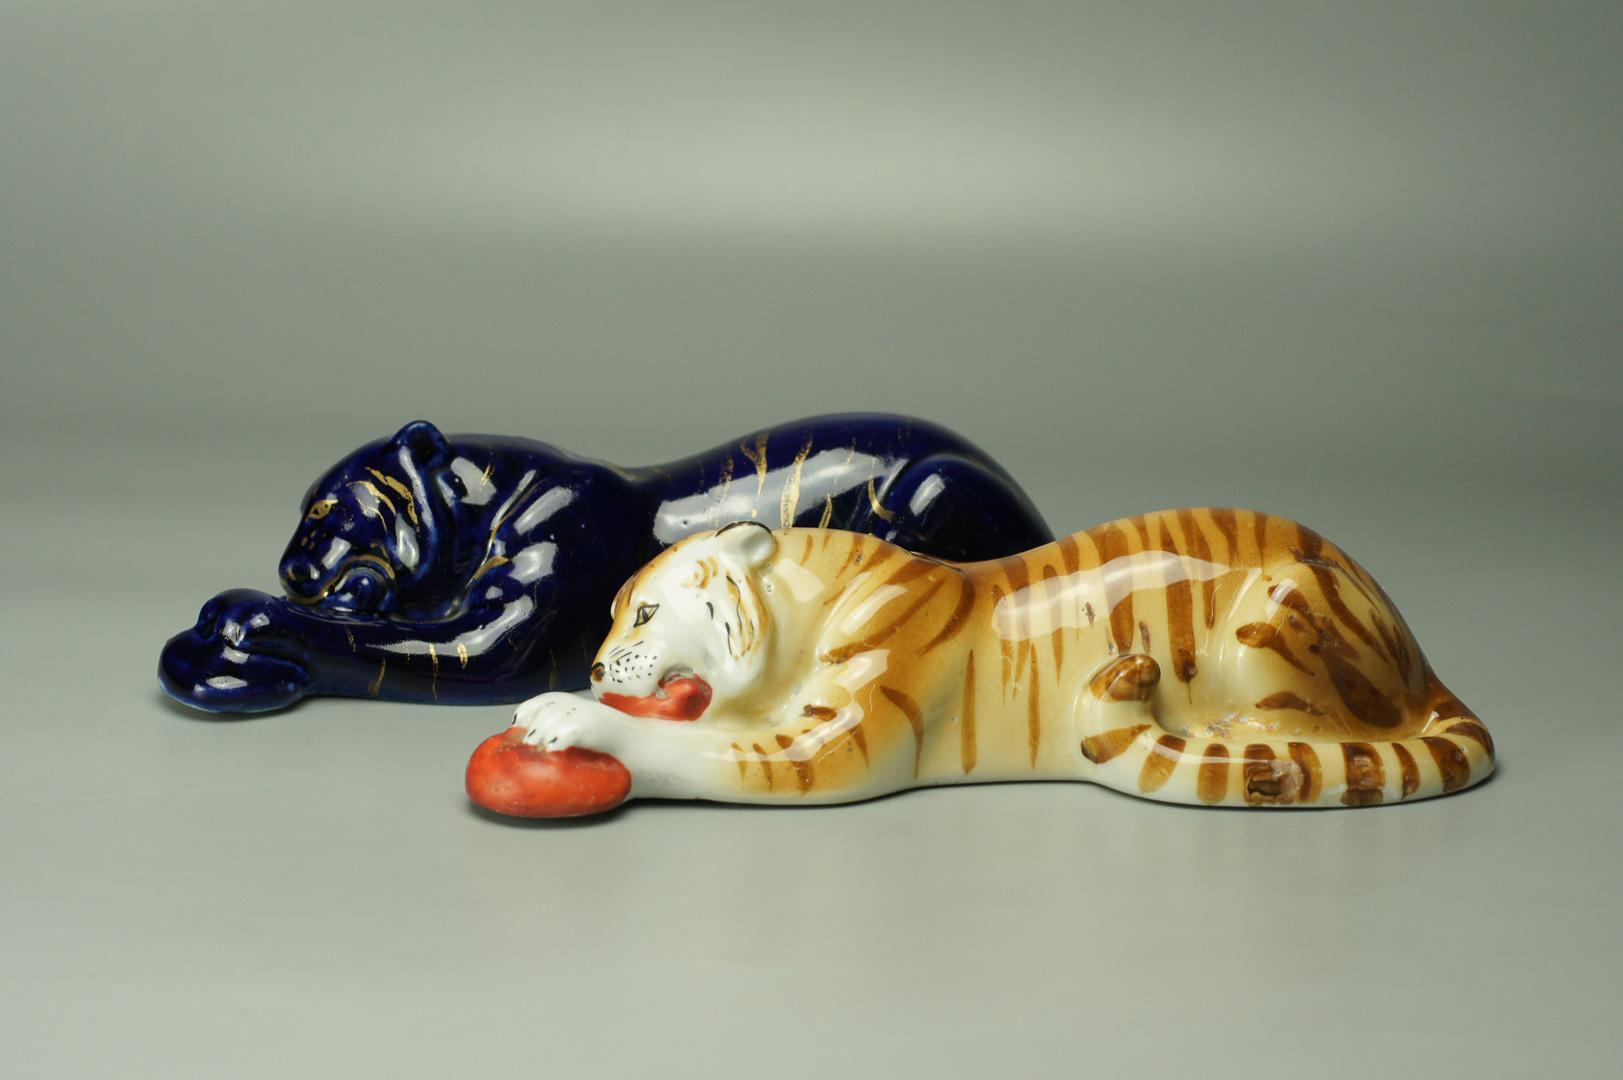 Статуэтка Тигр с мясом лфз